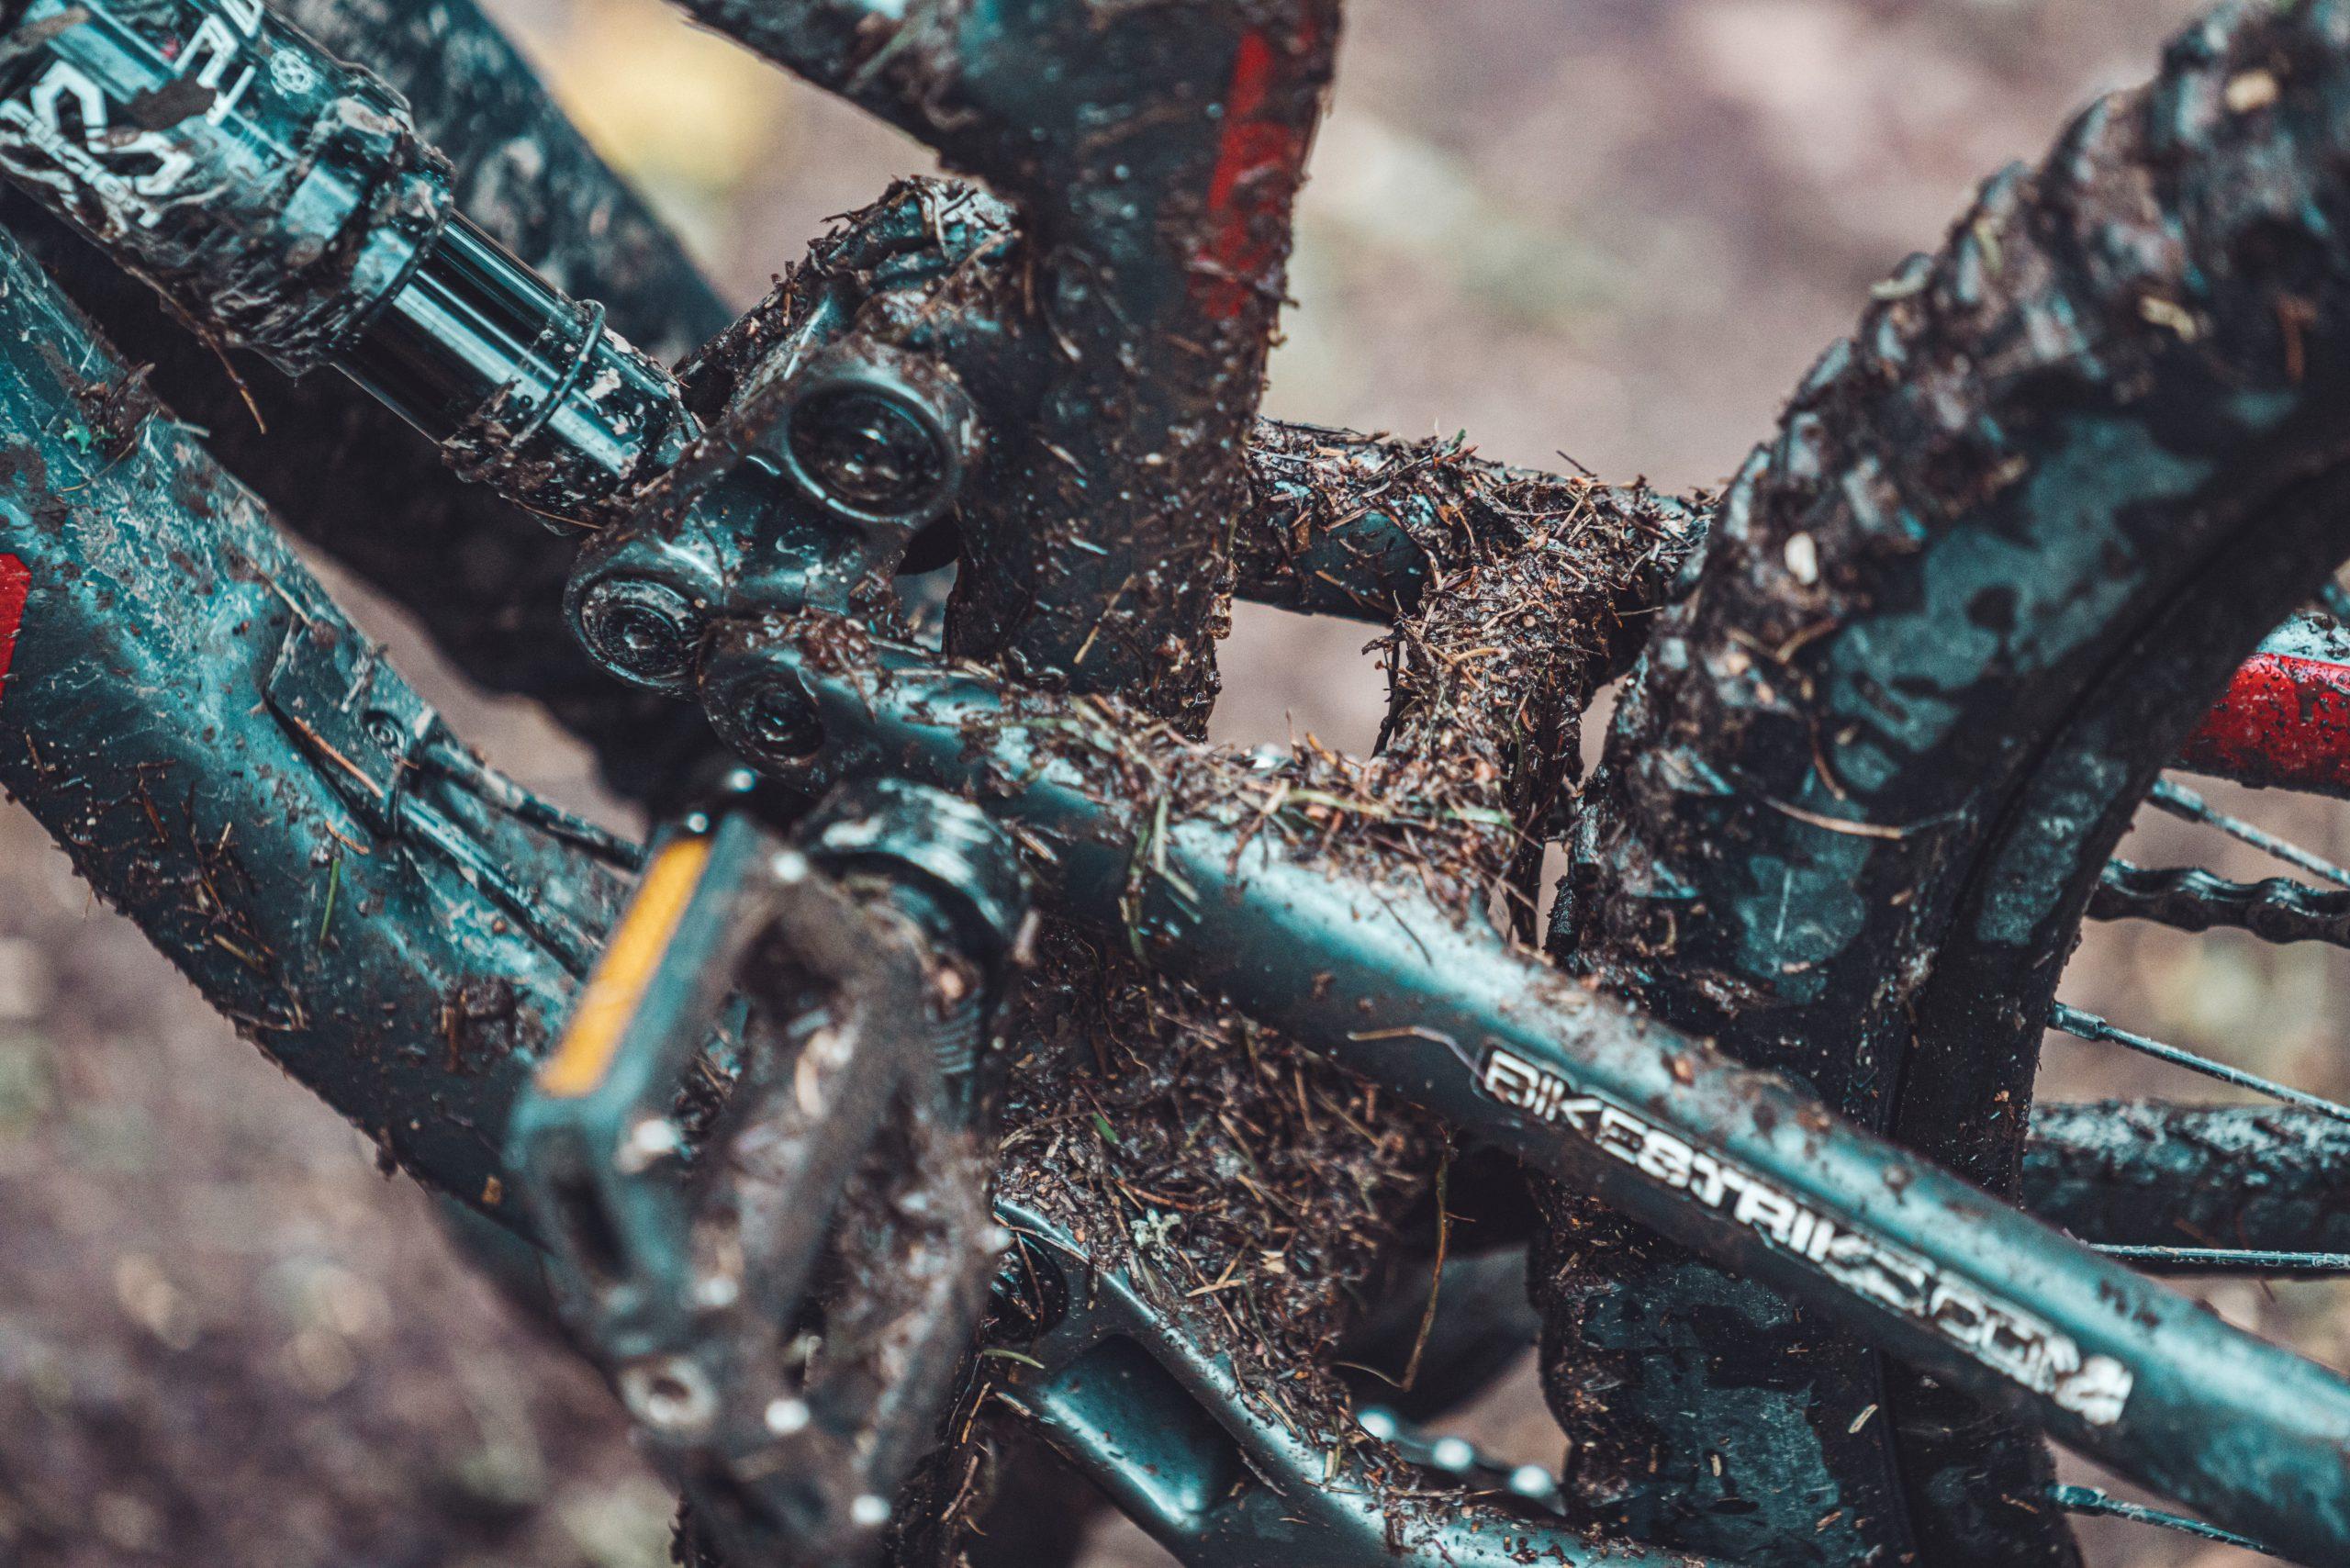 Imagen de bicicleta con lodo por todas partes